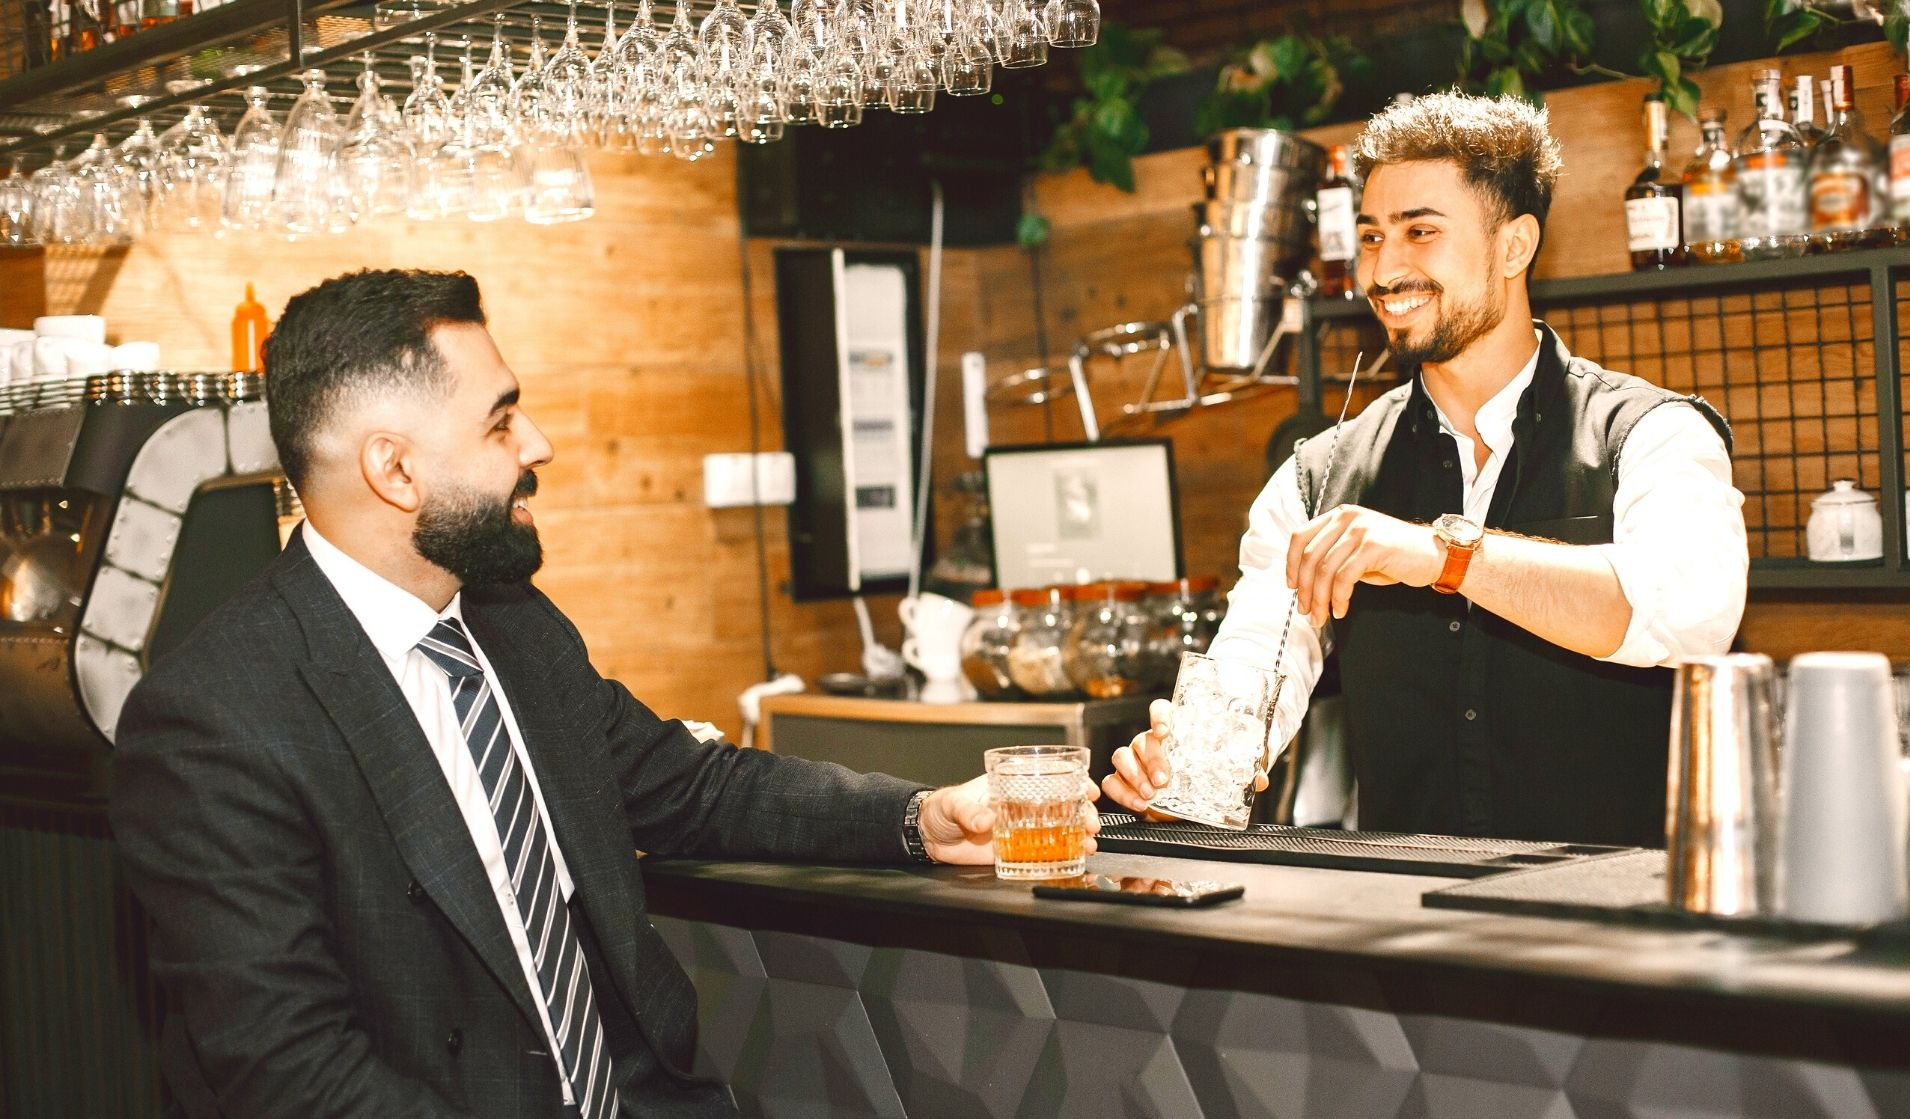 manage pub, bar, cafe like a pro